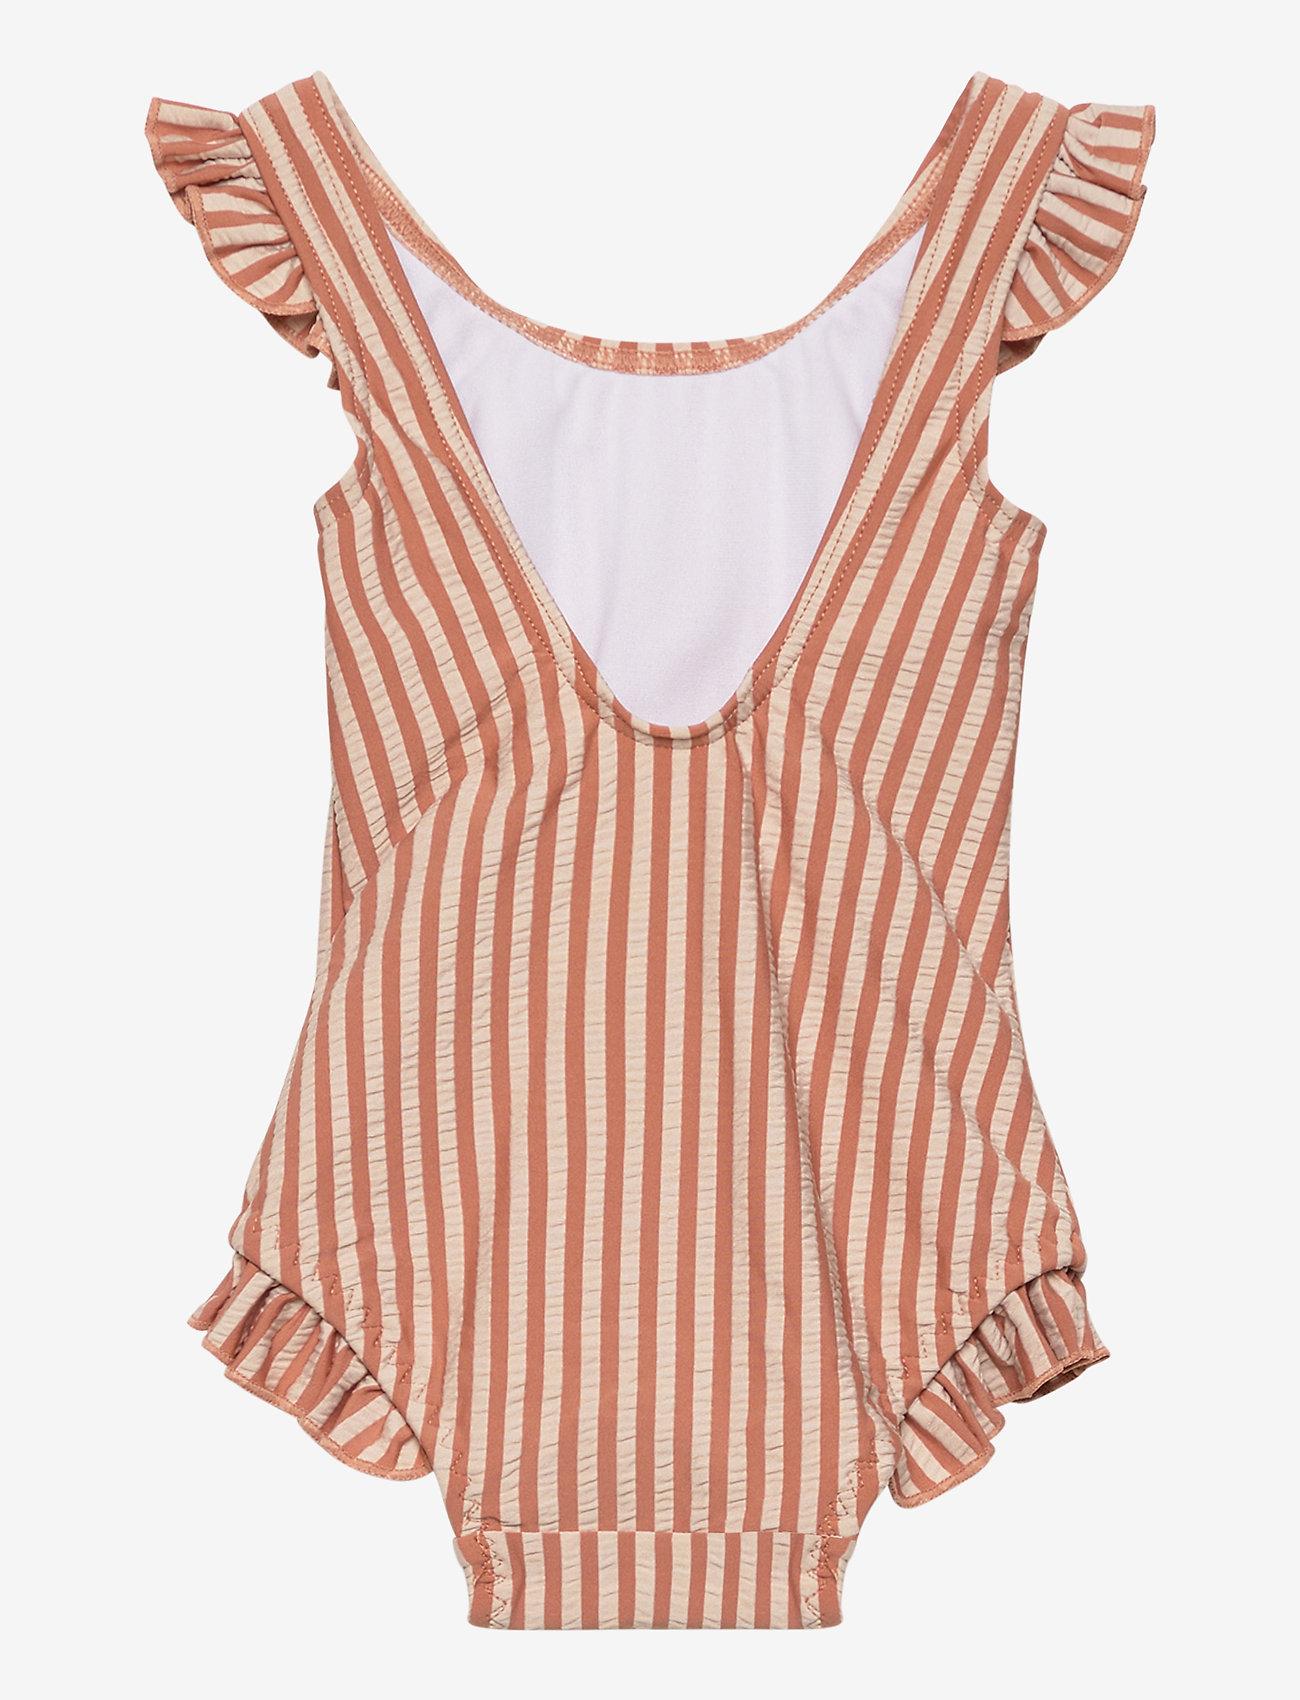 Liewood - Tanna swimsuit seersucker - swimsuits - y/d stripe - 1